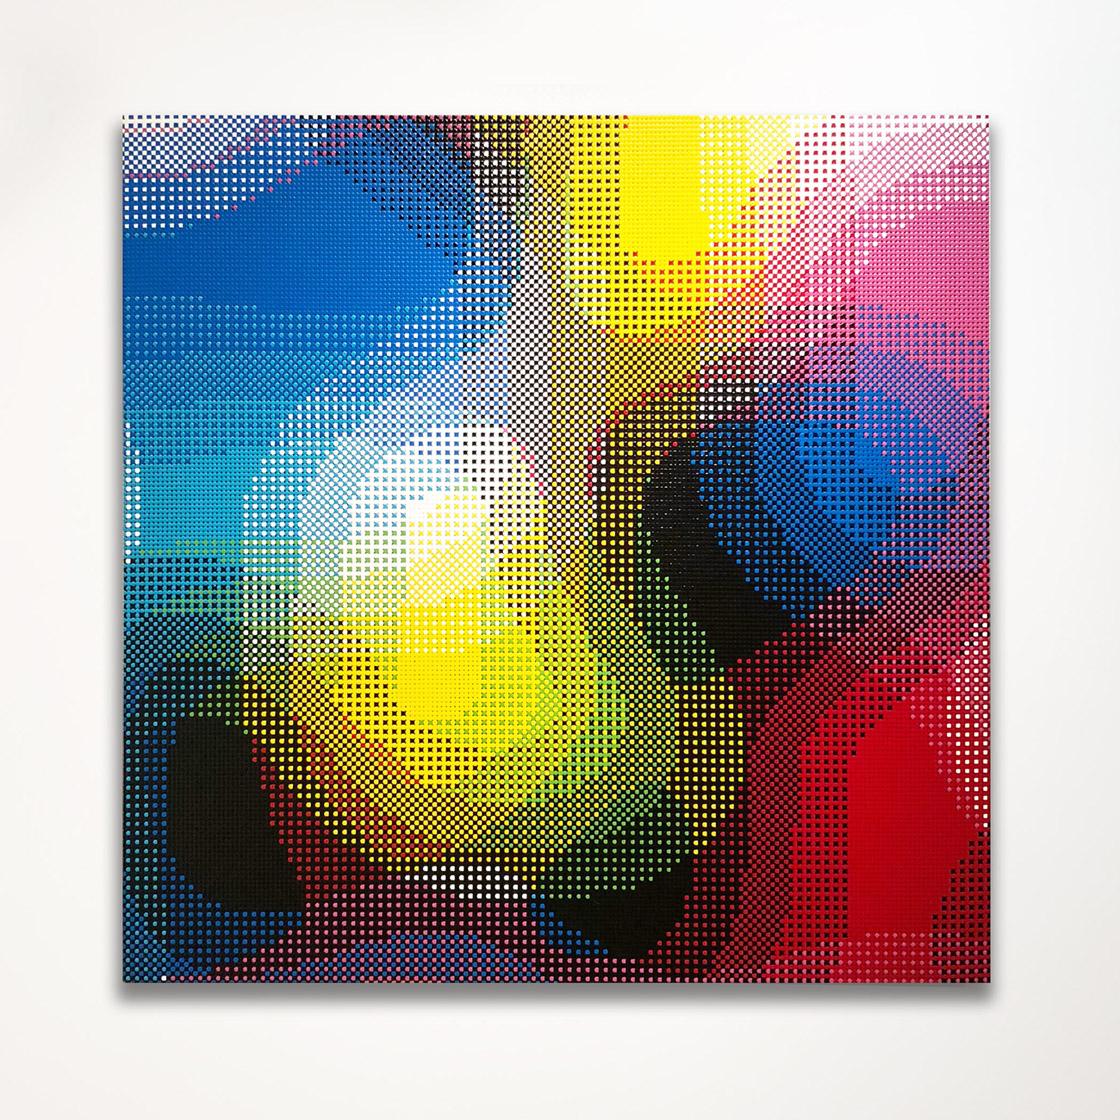 William Betts, Monitor, Colorspace XXVI